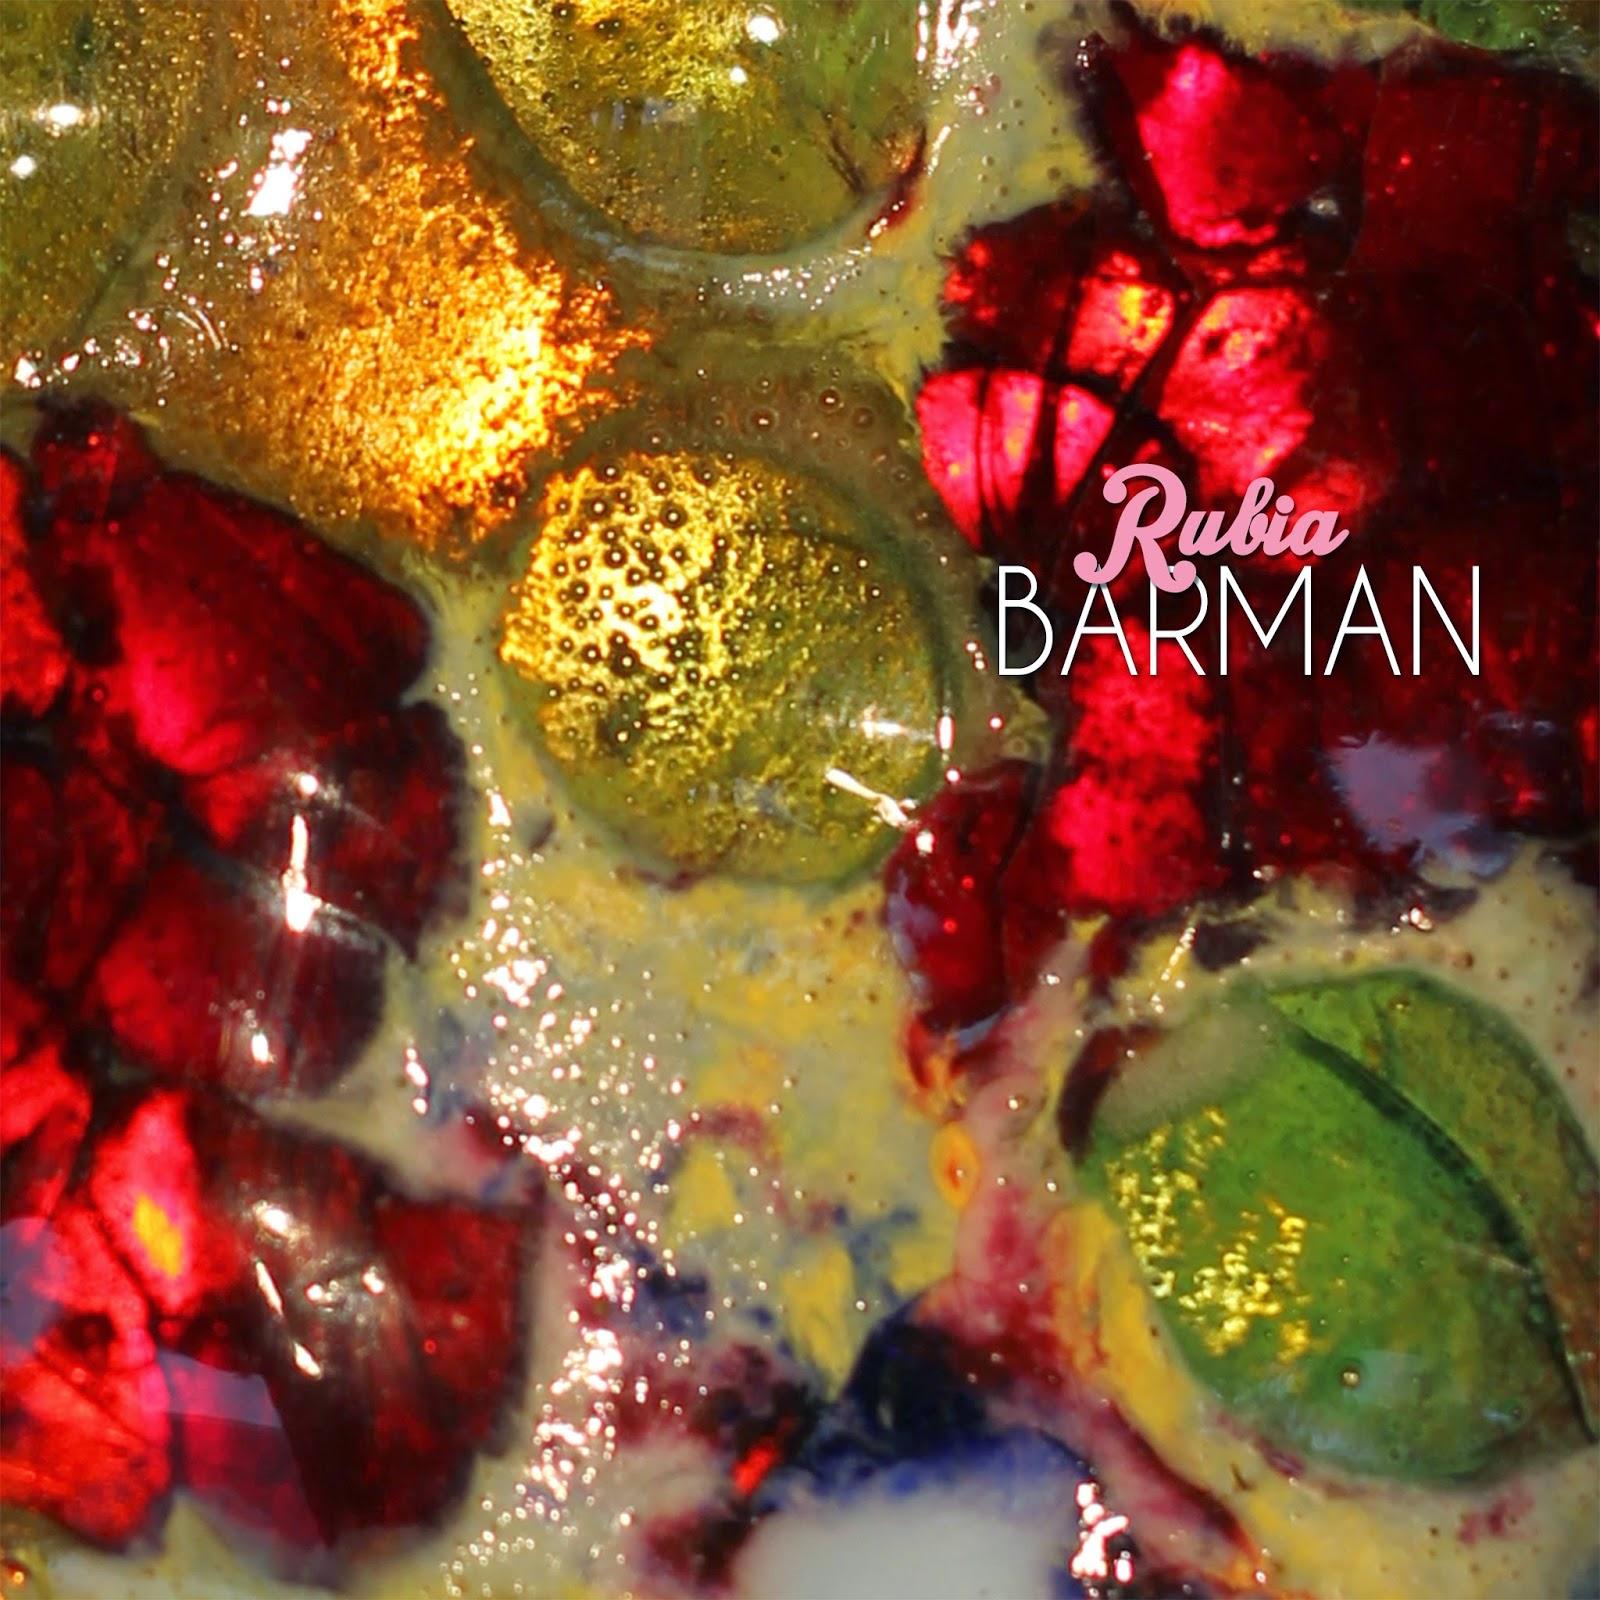 portada BARMAN disco RUBIA